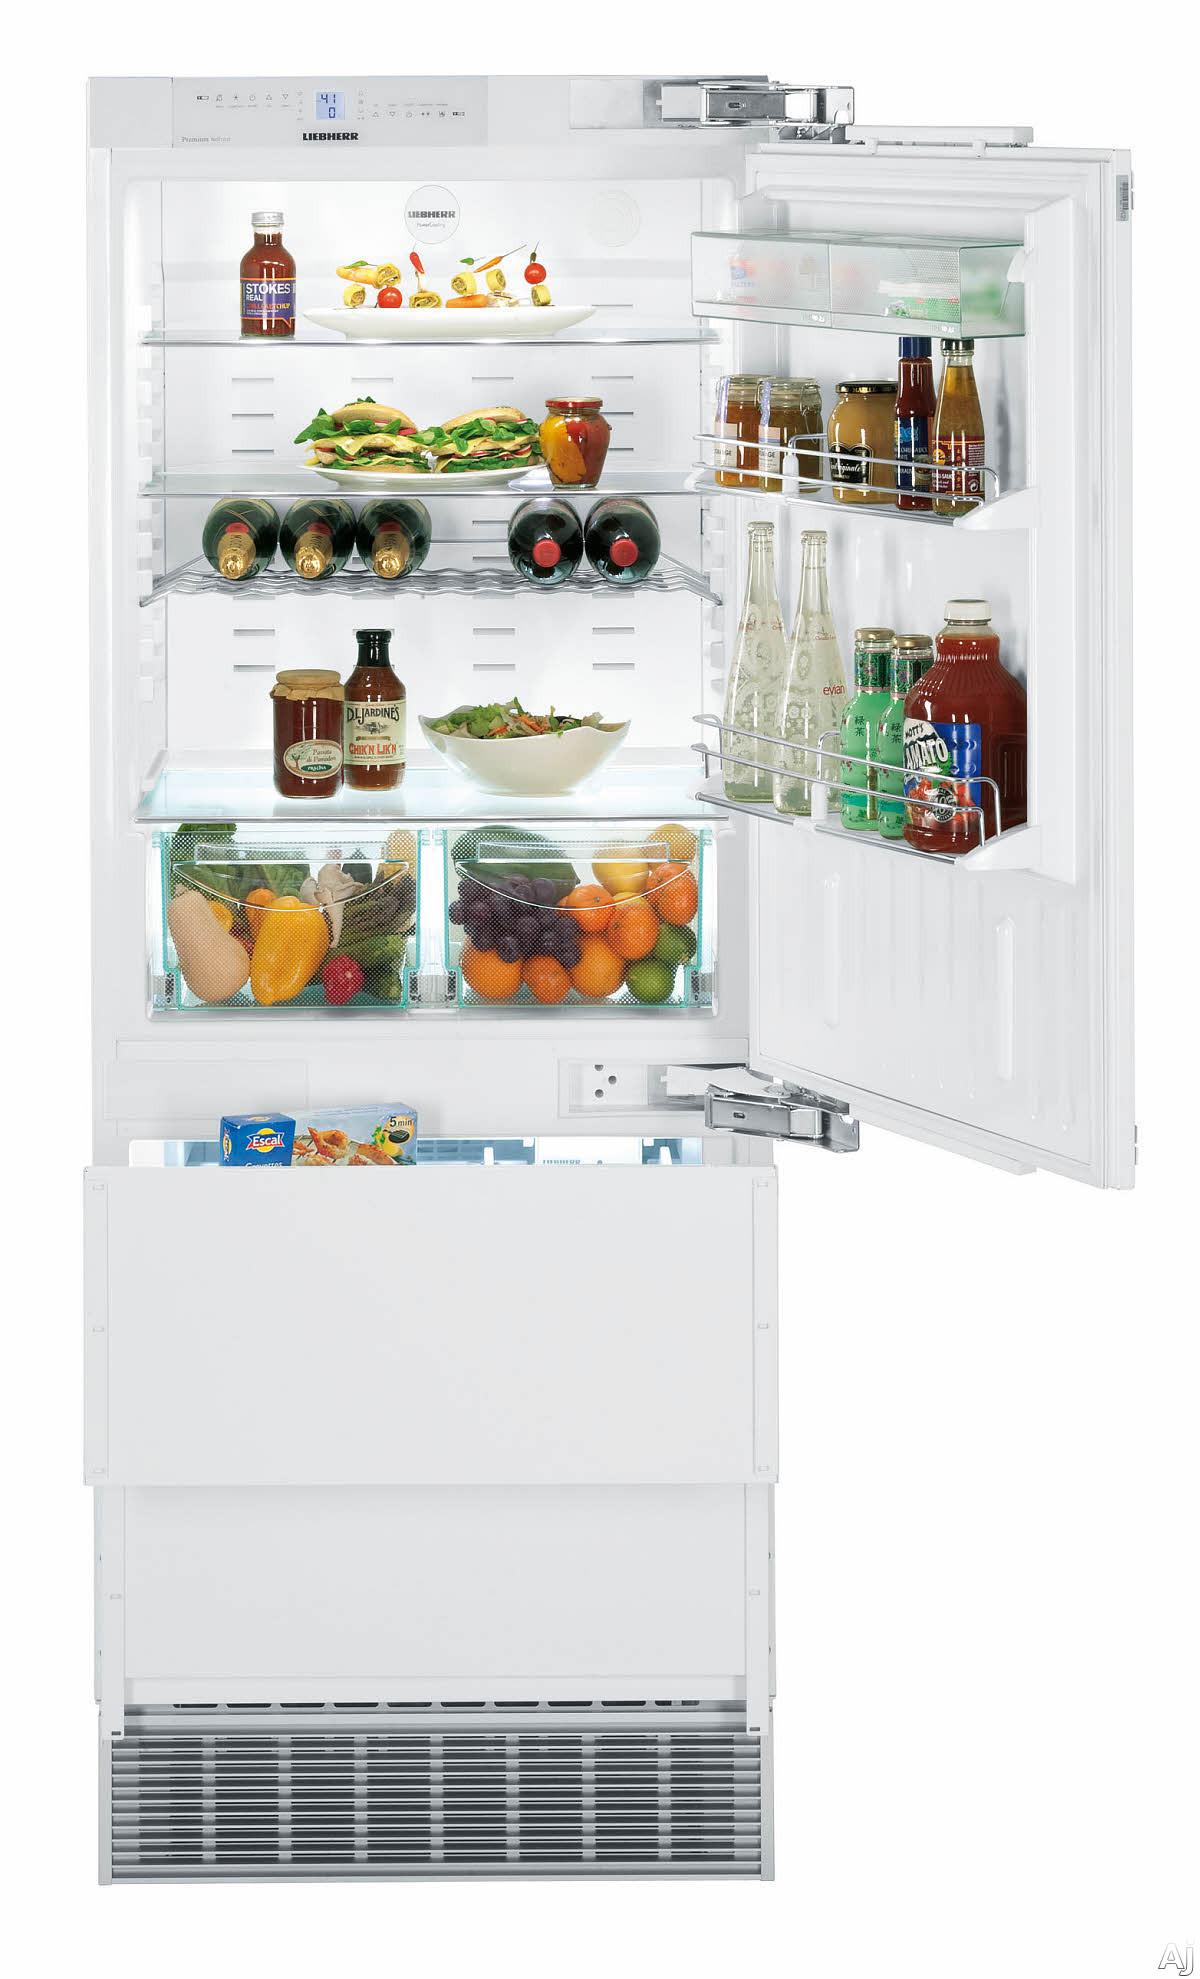 Liebherr HC1550 30 Inch Built-in Panel Ready Refrigerator with 2 Bottom Freezer Drawers, 2 Adjustable GlassLine Shelves, Wine Rack, Adjustable Door Bins, 2 Produce Drawers, Ice Maker, LED Lighting and ENERGY STAR Rated HC1550